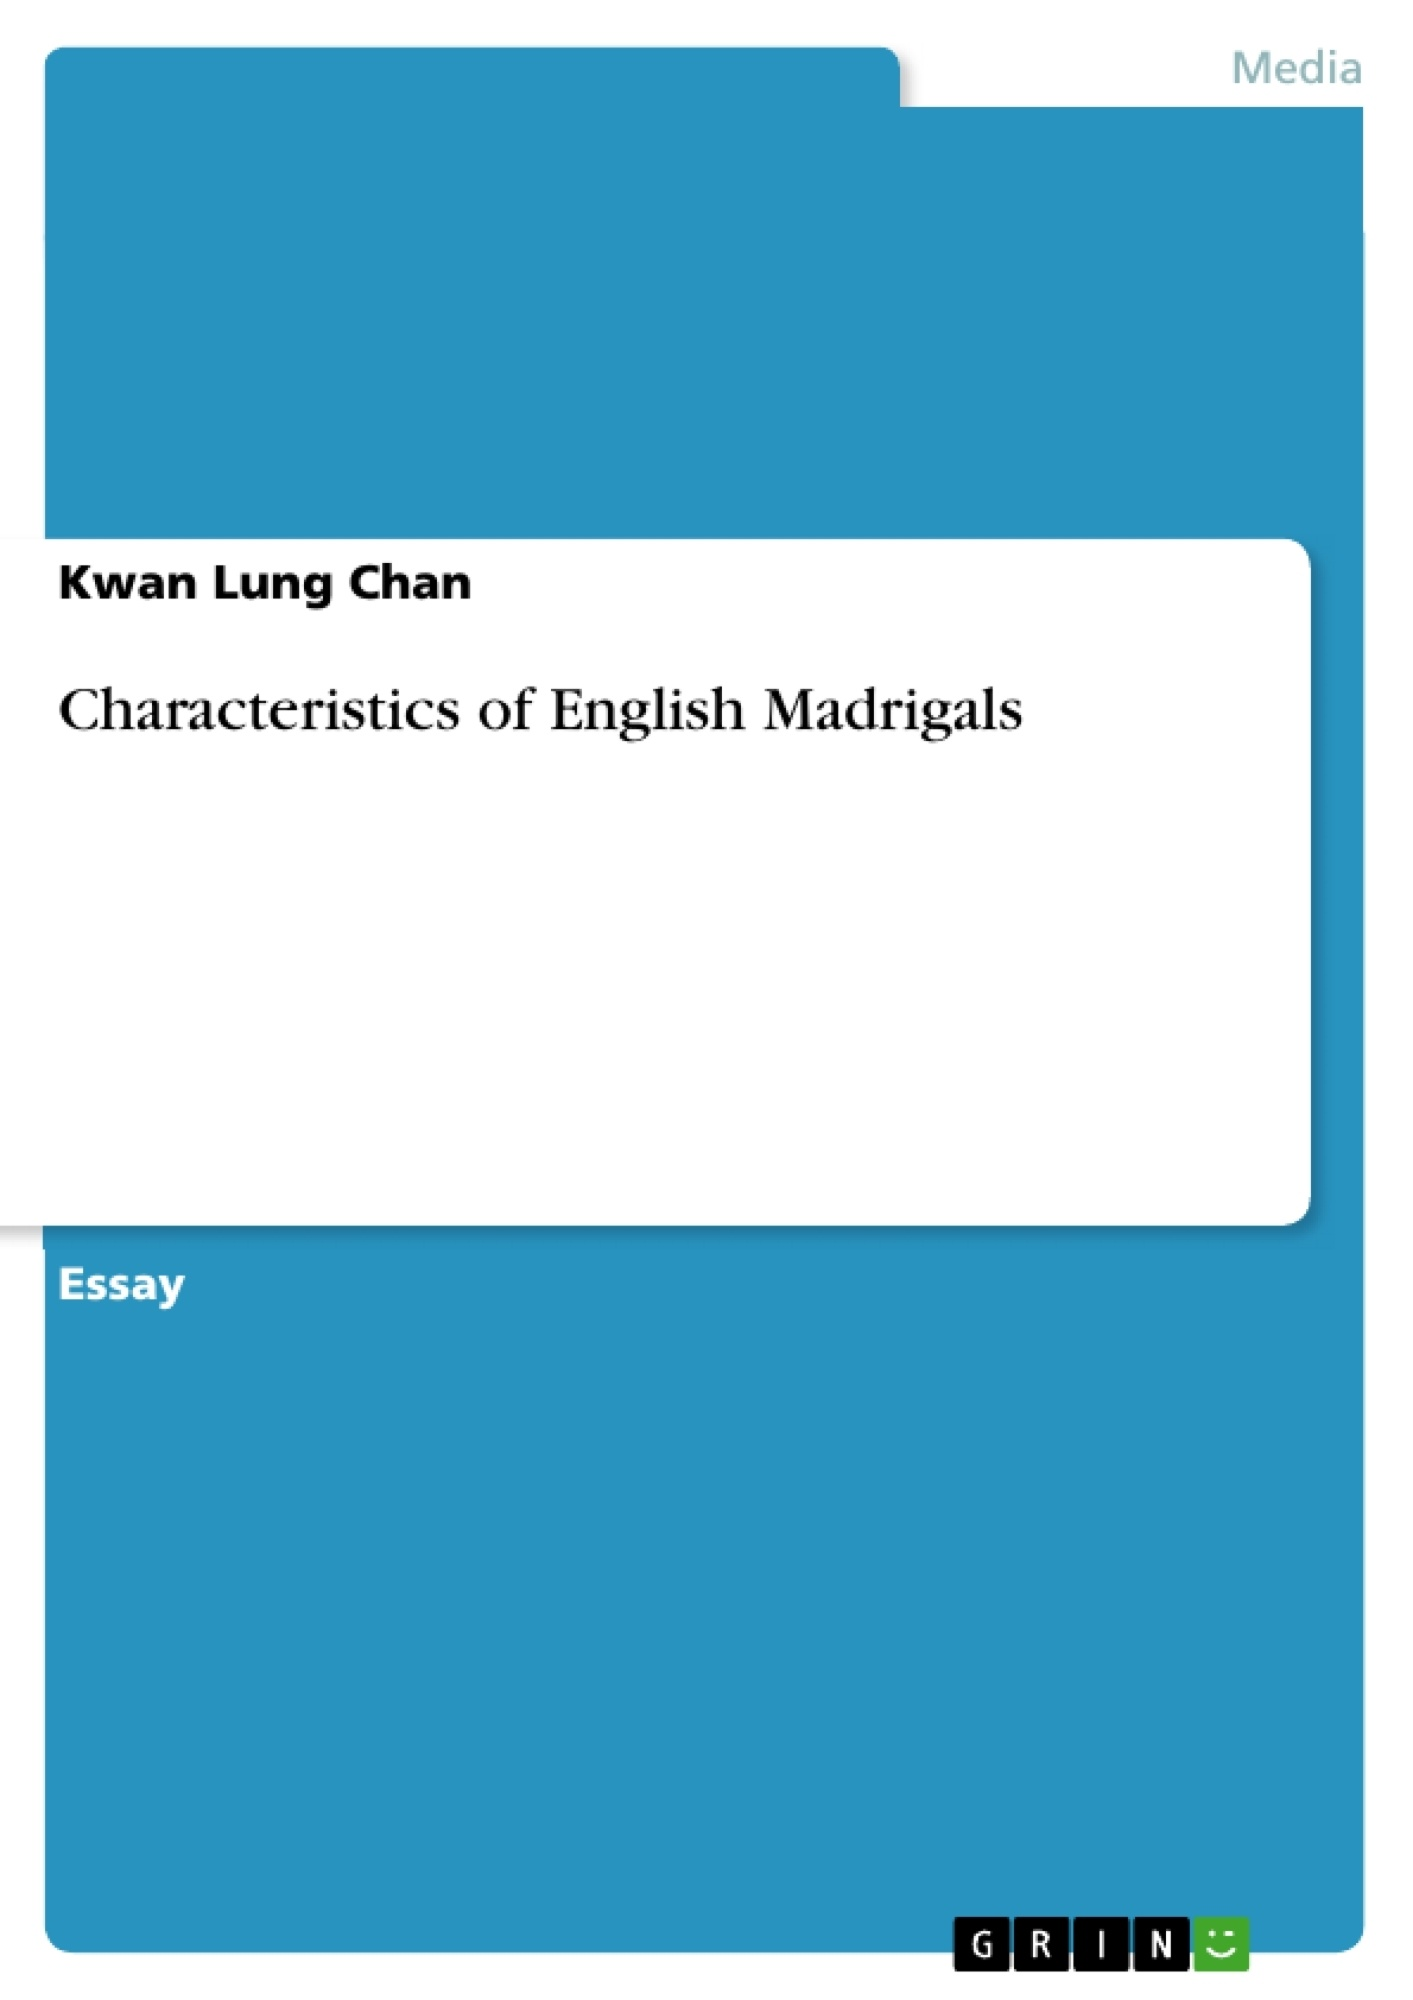 Title: Characteristics of English Madrigals